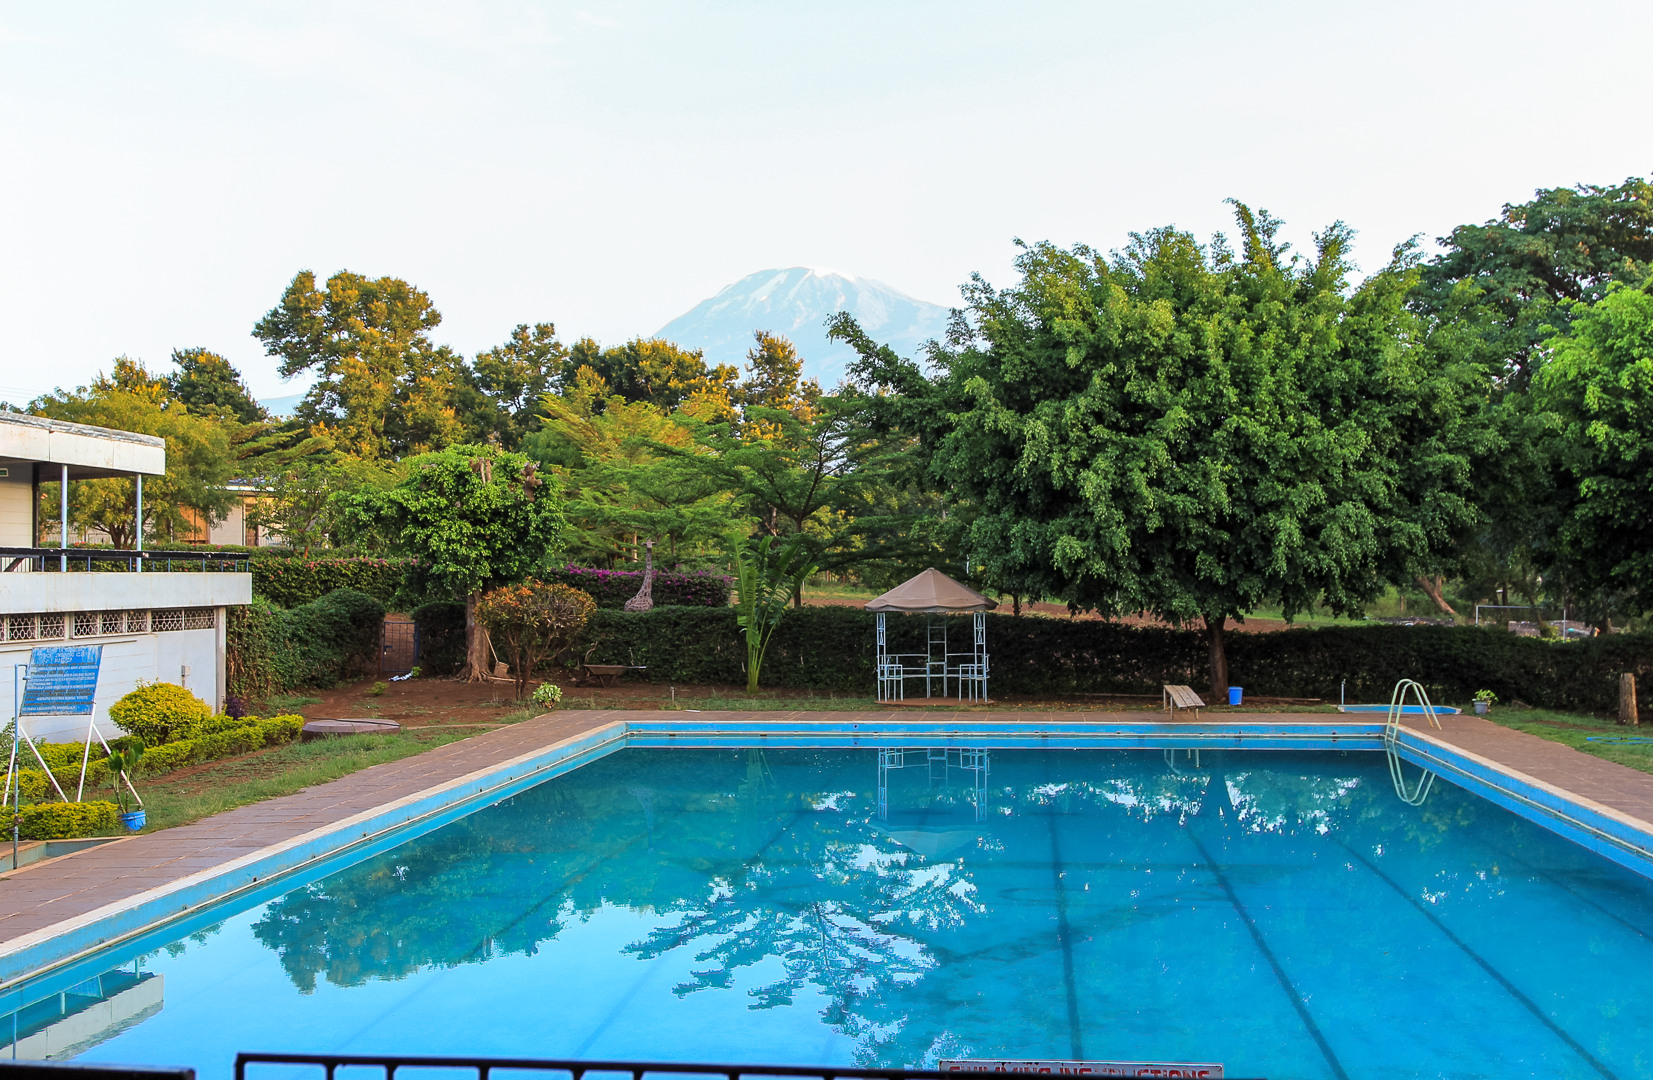 Бассейн в хостеле YMCA, Килиманжаро